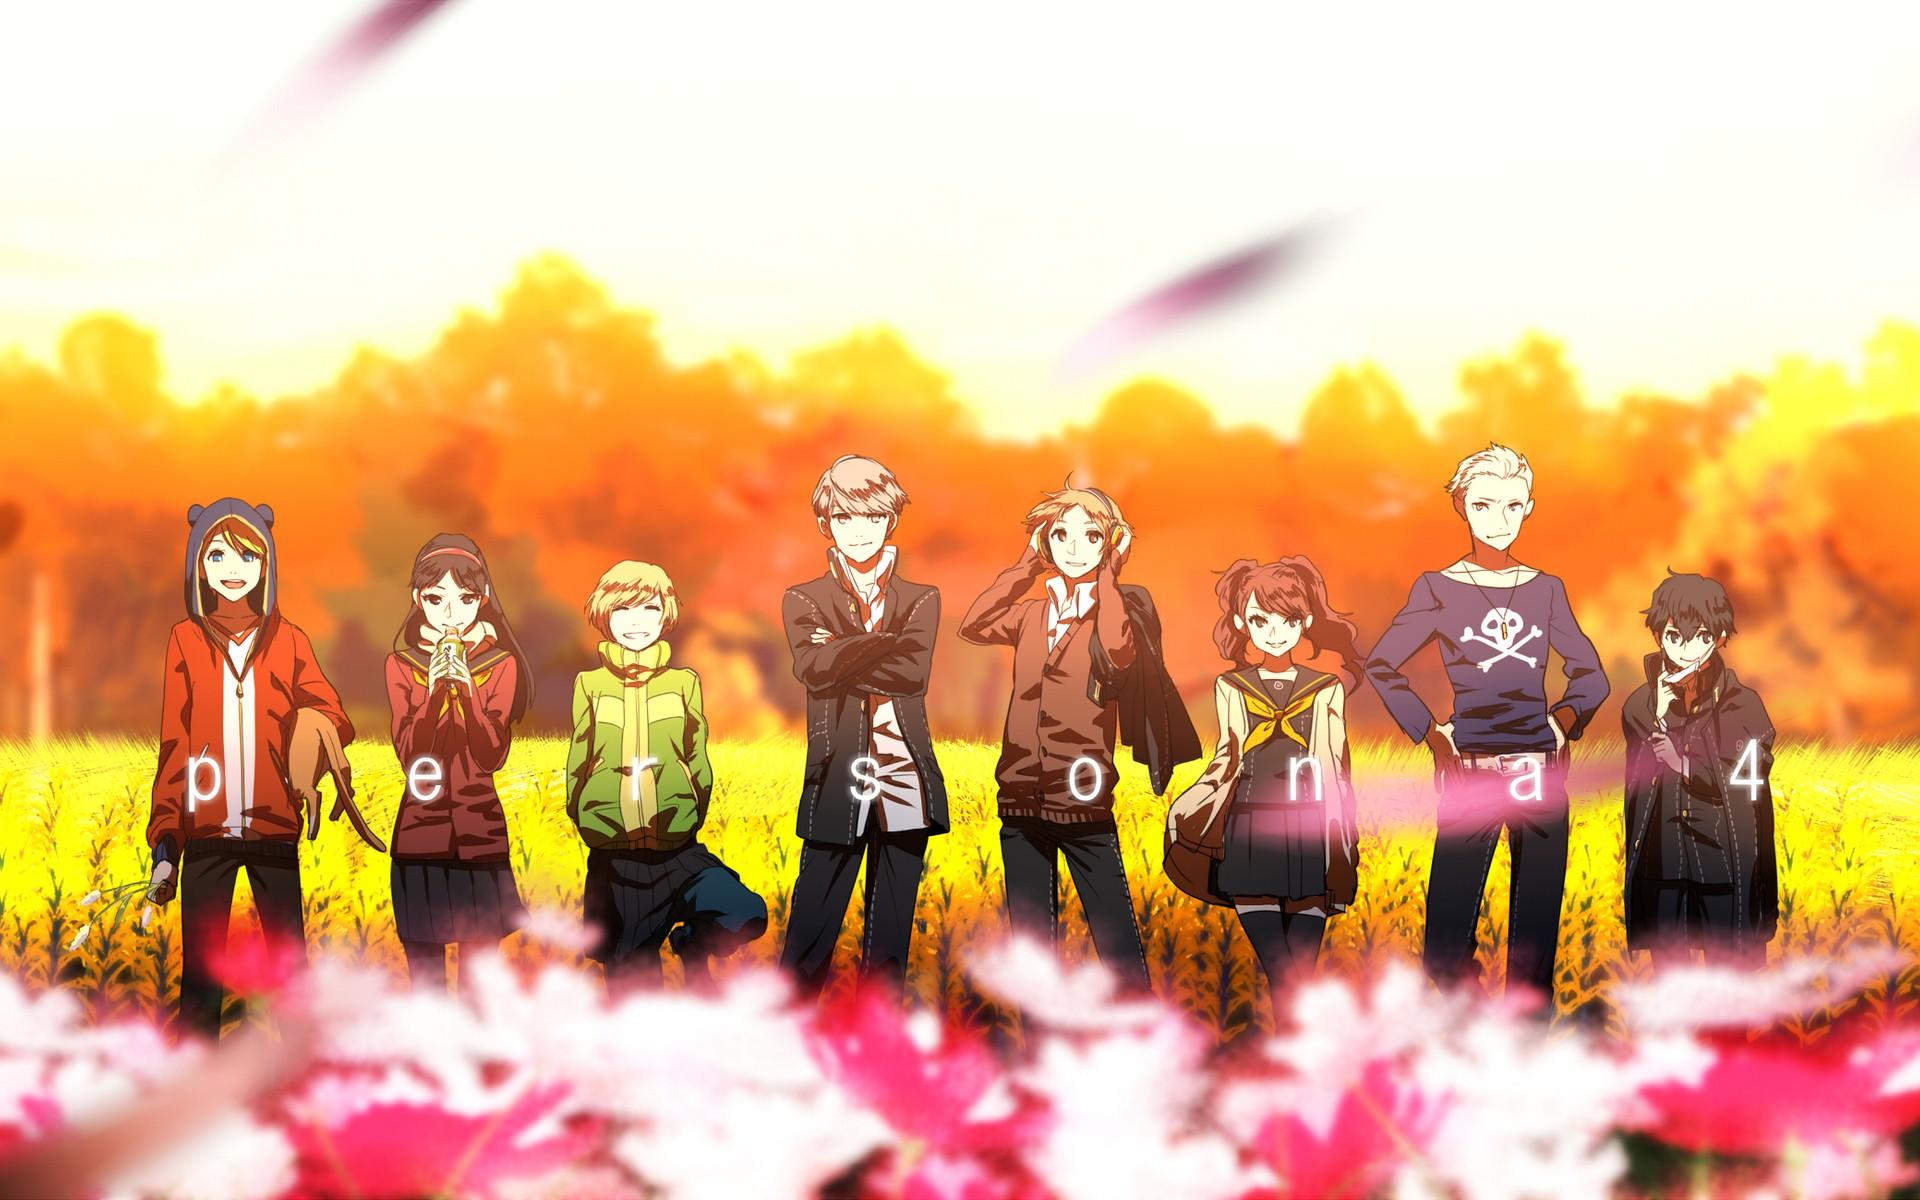 Anime 1920x1200 Persona 4 anime girls anime colorful anime boys standing Hanamura Yosuke Satonaka Chie Narukami Yu Amagi Yukiko Tatsumi Kanji Kujikawa Rise Shirogane Naoto Teddie